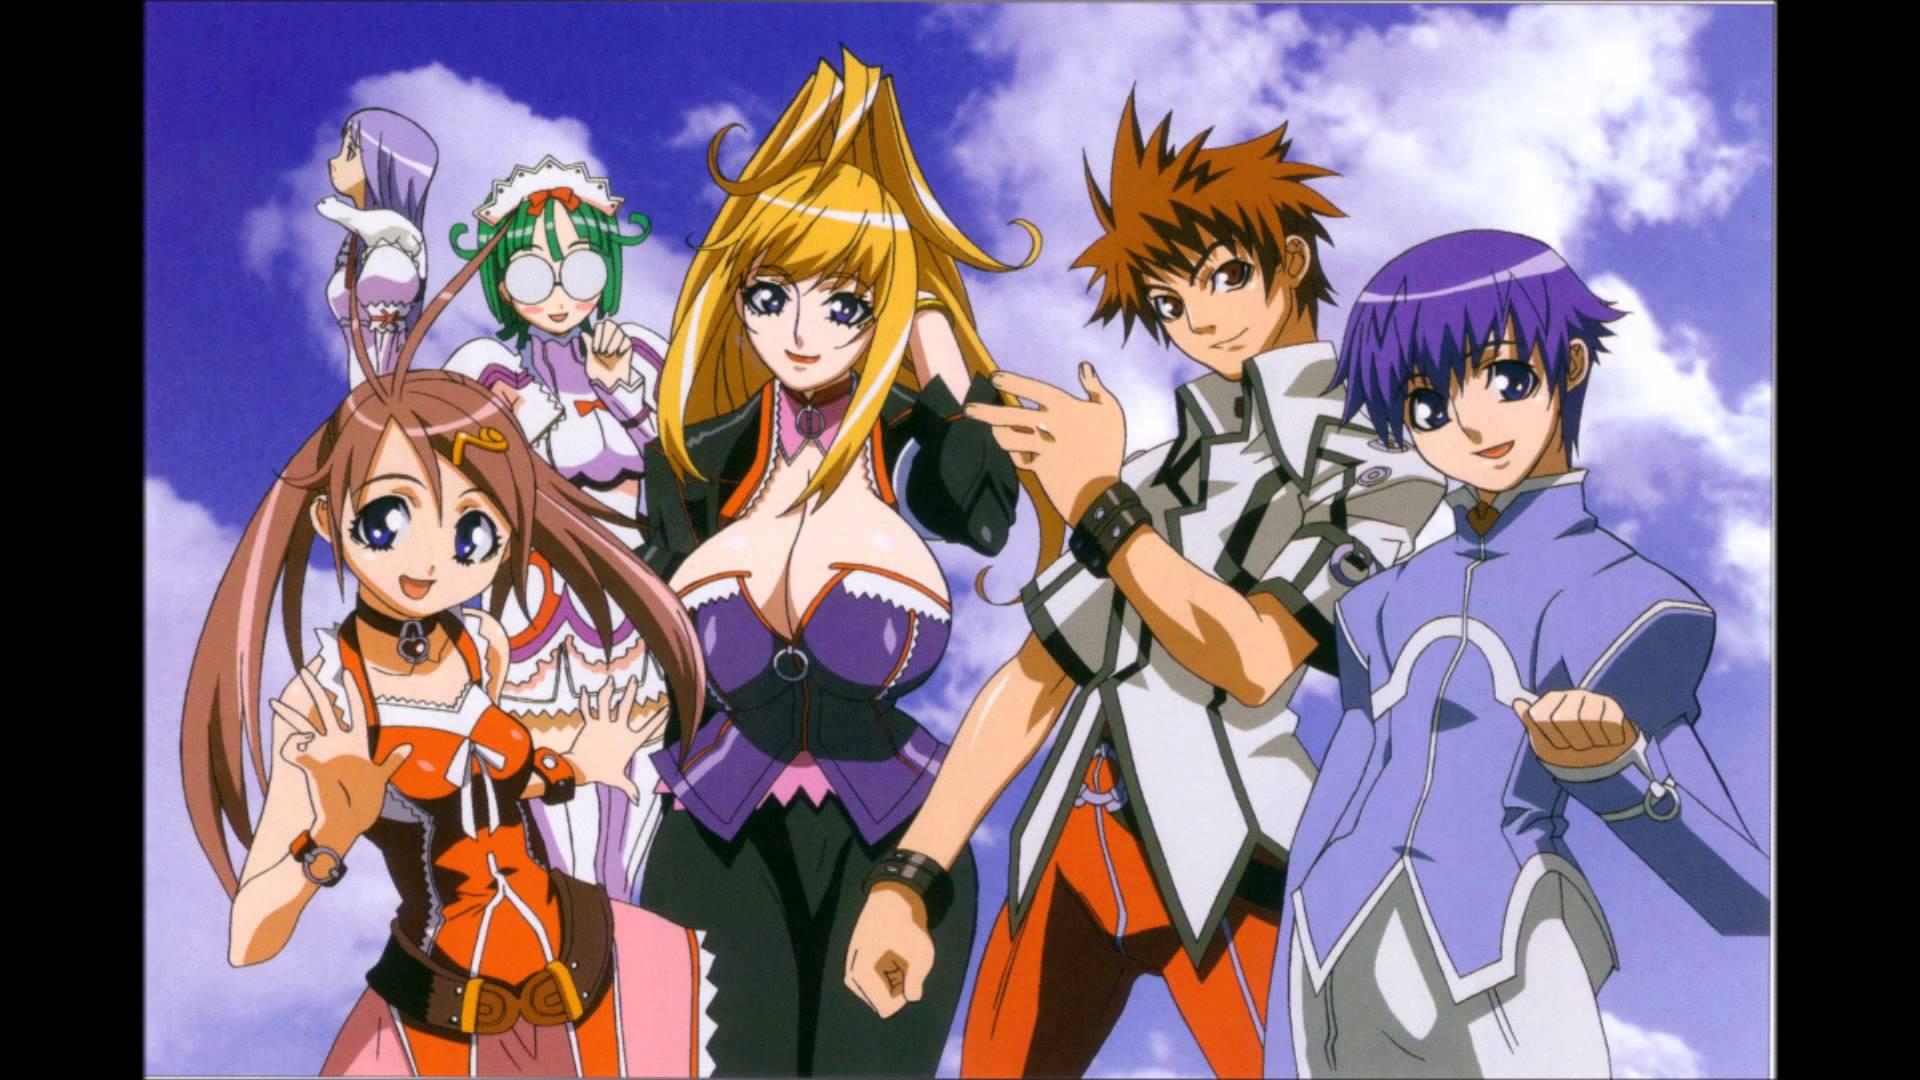 Watch Anime Romance Movies 14 Hd Wallpaper Animewp Com